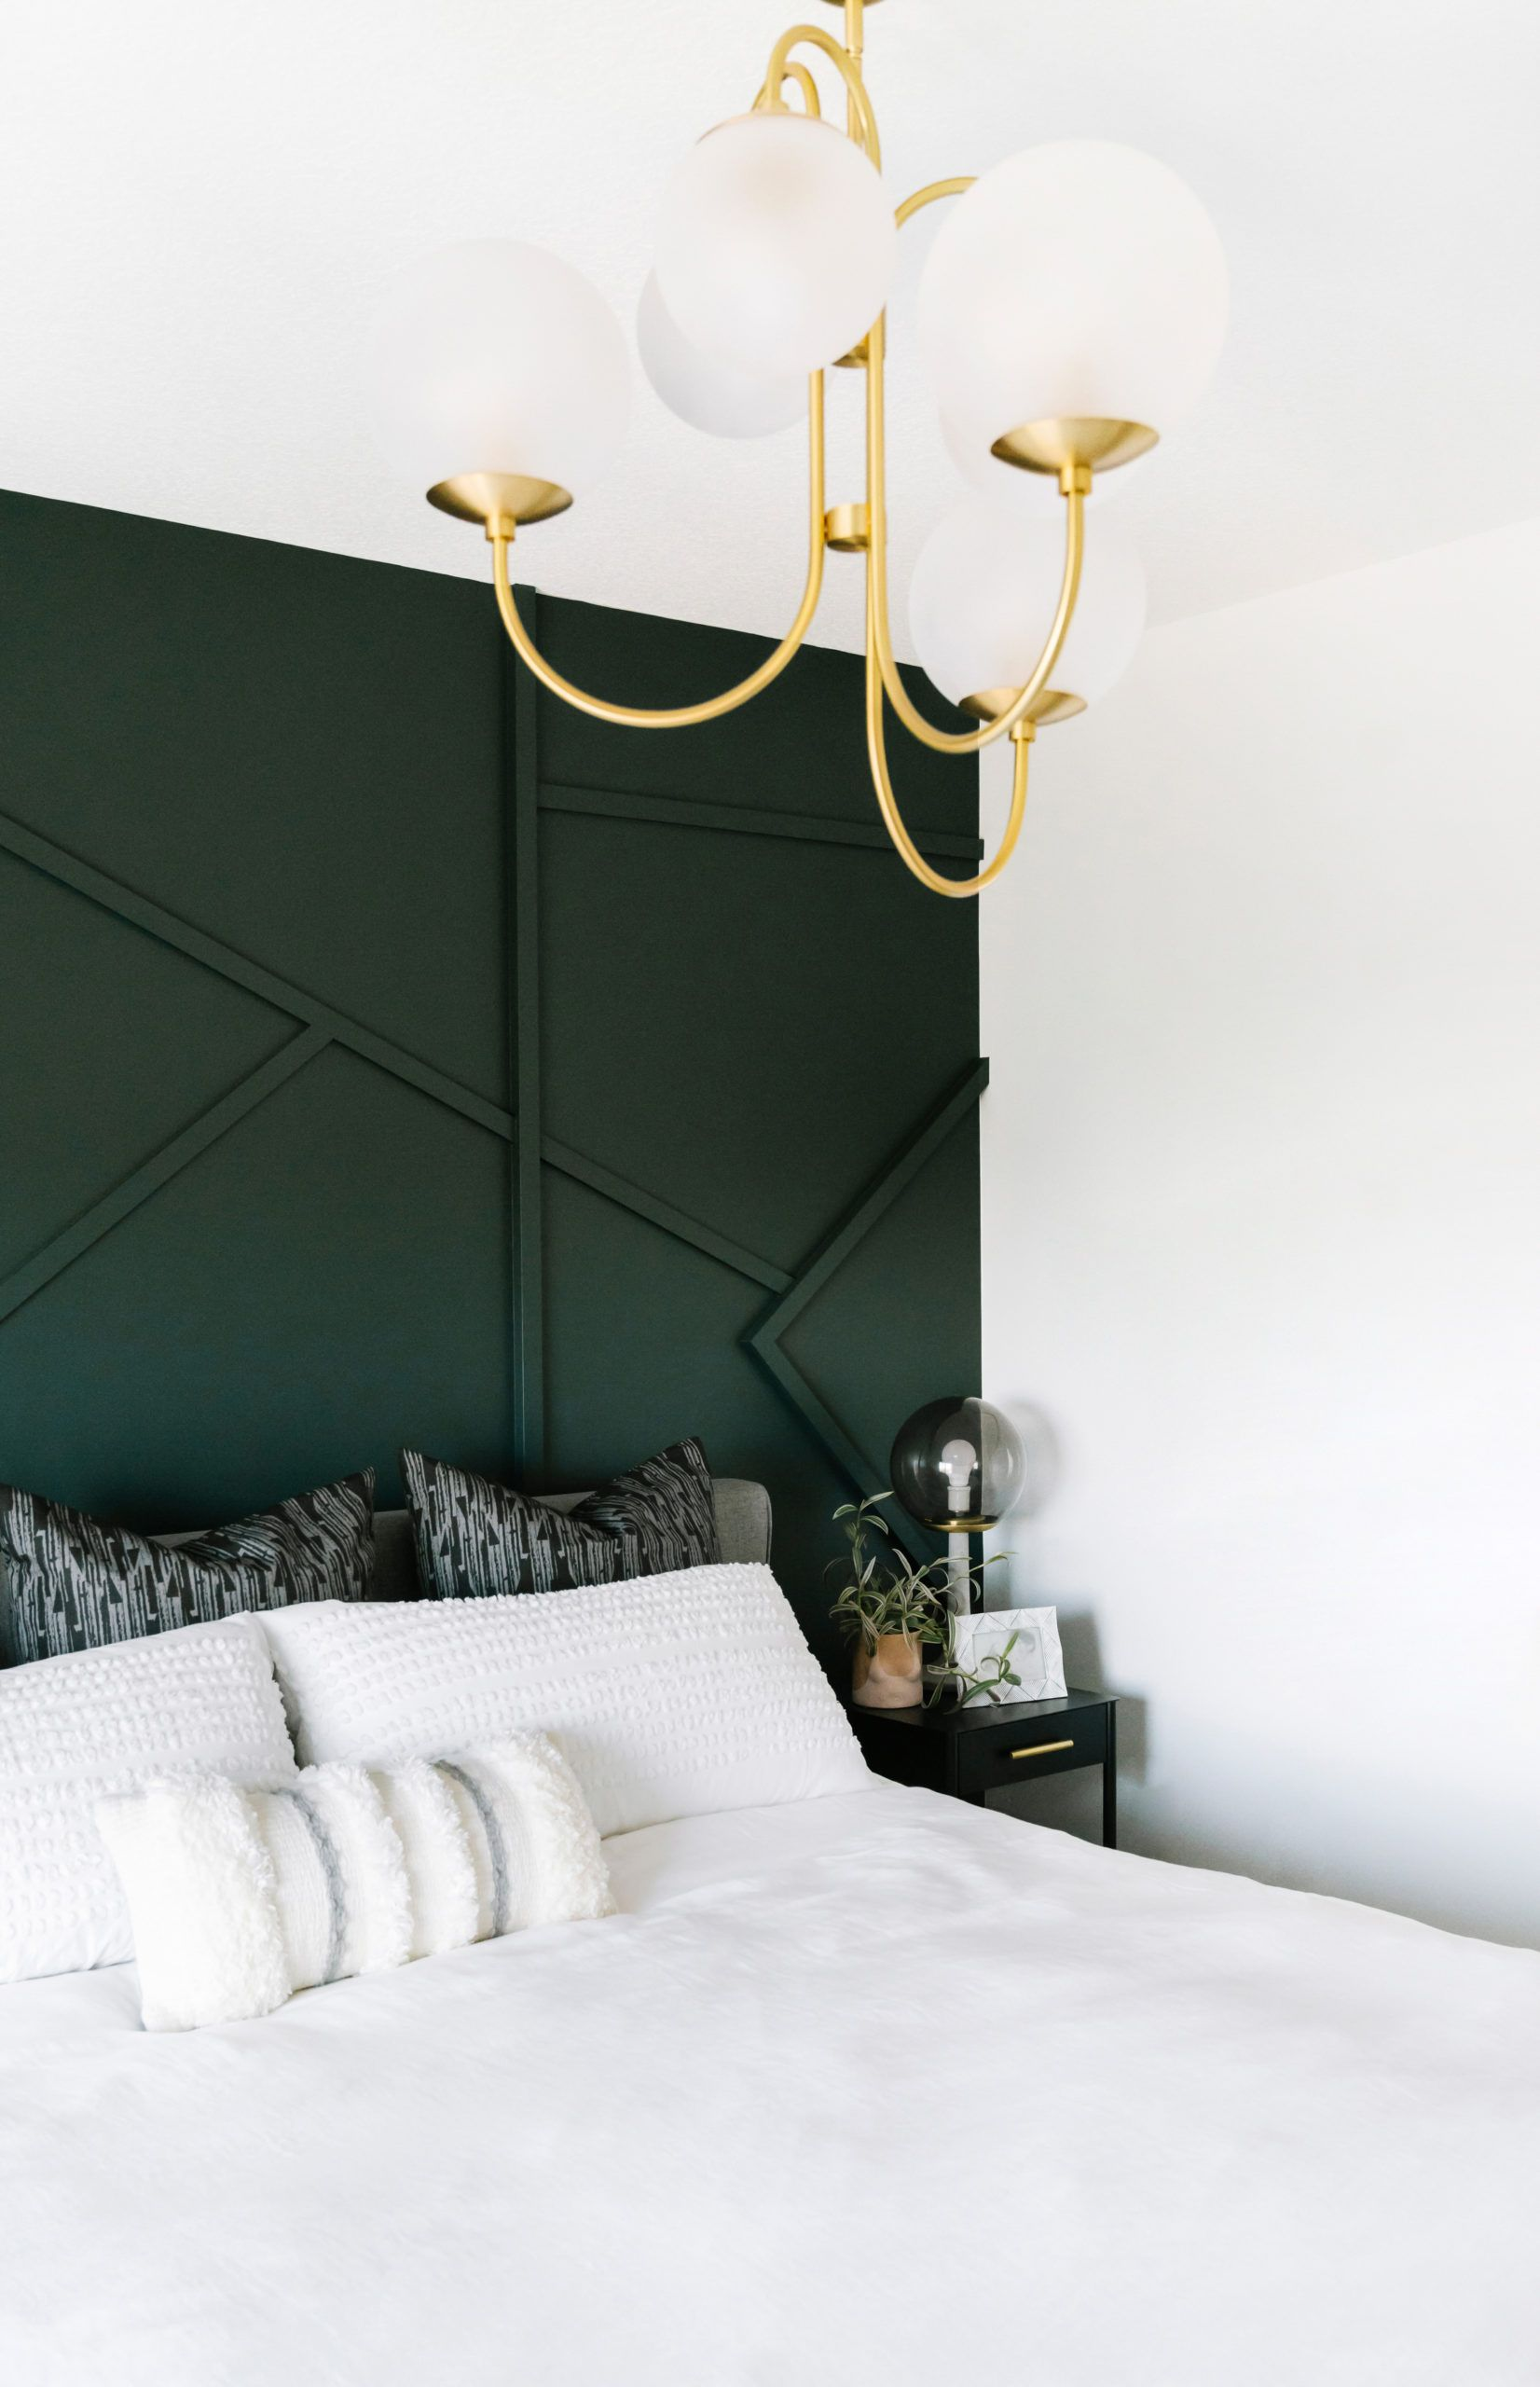 Dark Green Bedroom Inspiration Green Bedroom Decor Green Accent Walls Green Bedroom Walls Green minimalist room decoration